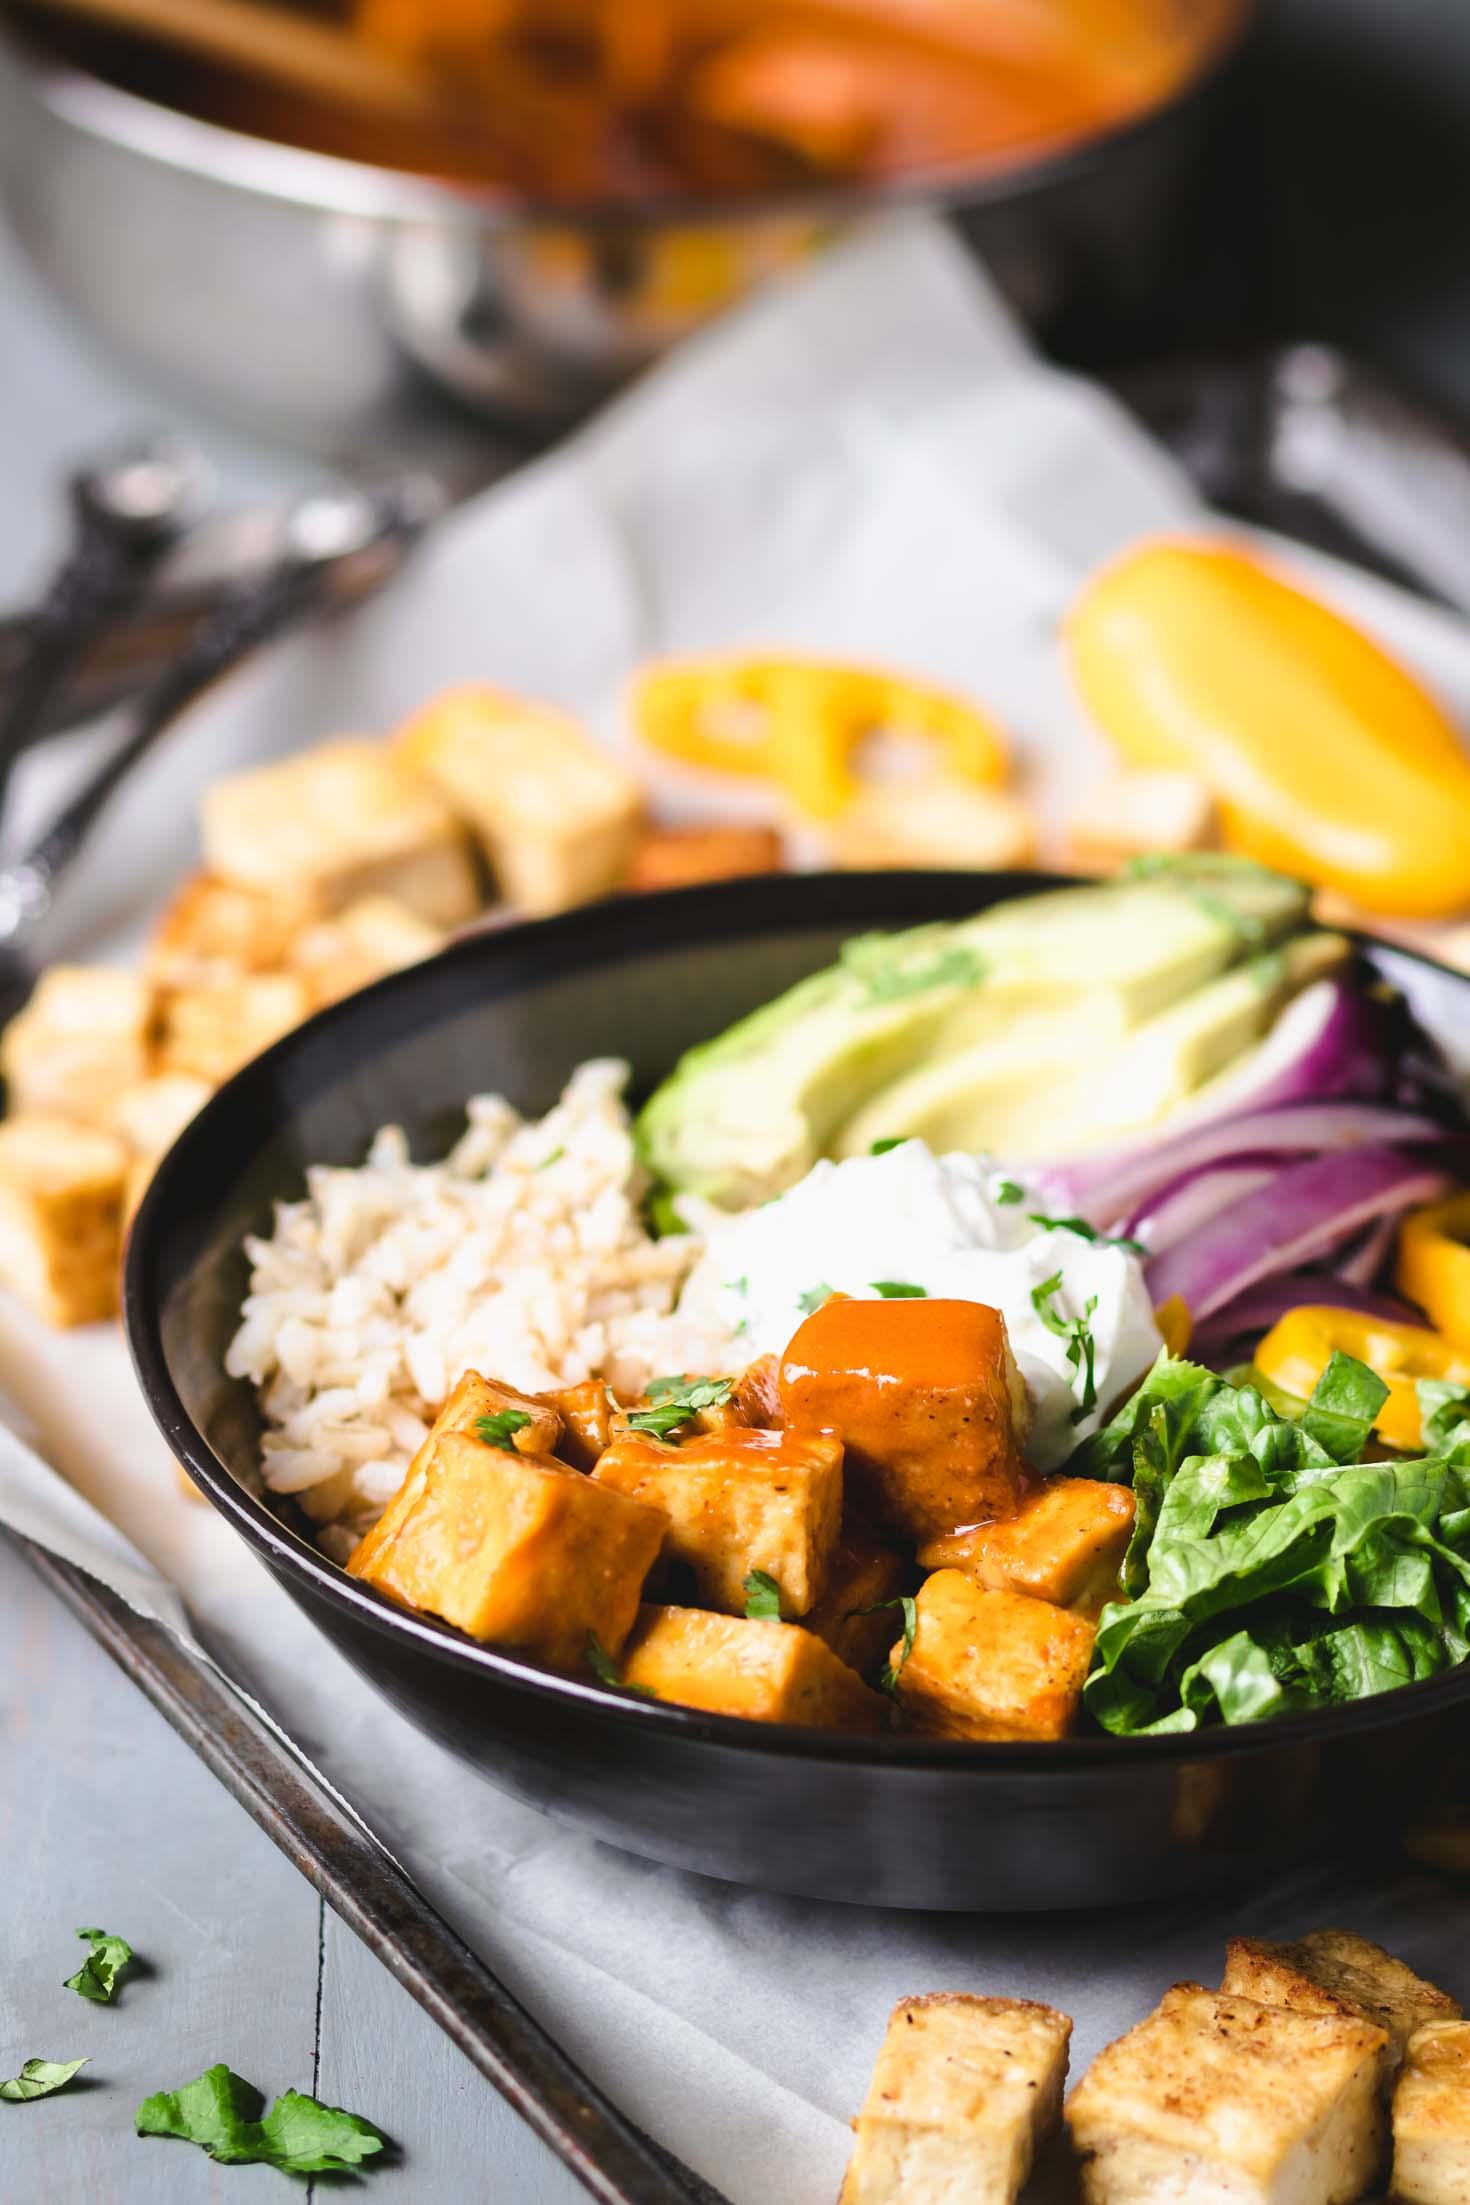 Vegan buffalo tofu burrito bowl-side view-buffalo tofu-brown rice-leaf lettuce-sauteed red onion-yellow pepper-vegan sour cream garnished with chopped cilantro in a round bowl